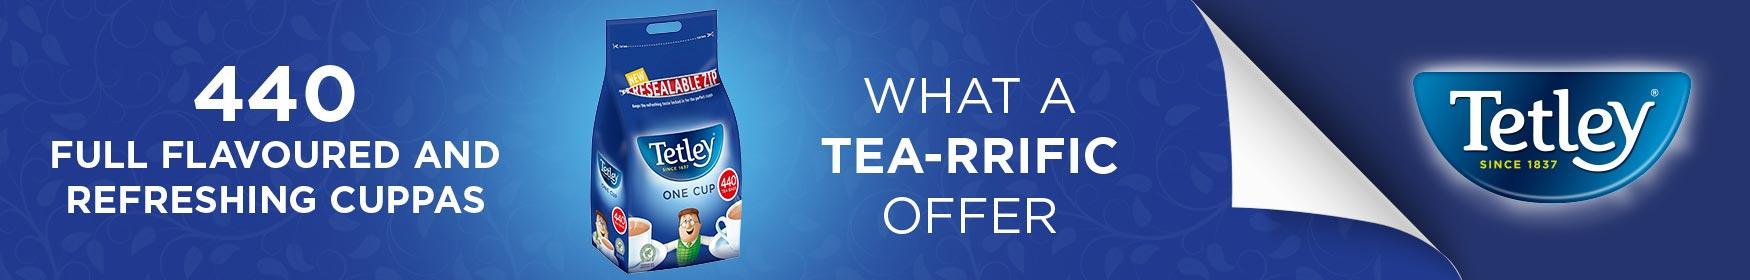 Tetley - it starts with Tea